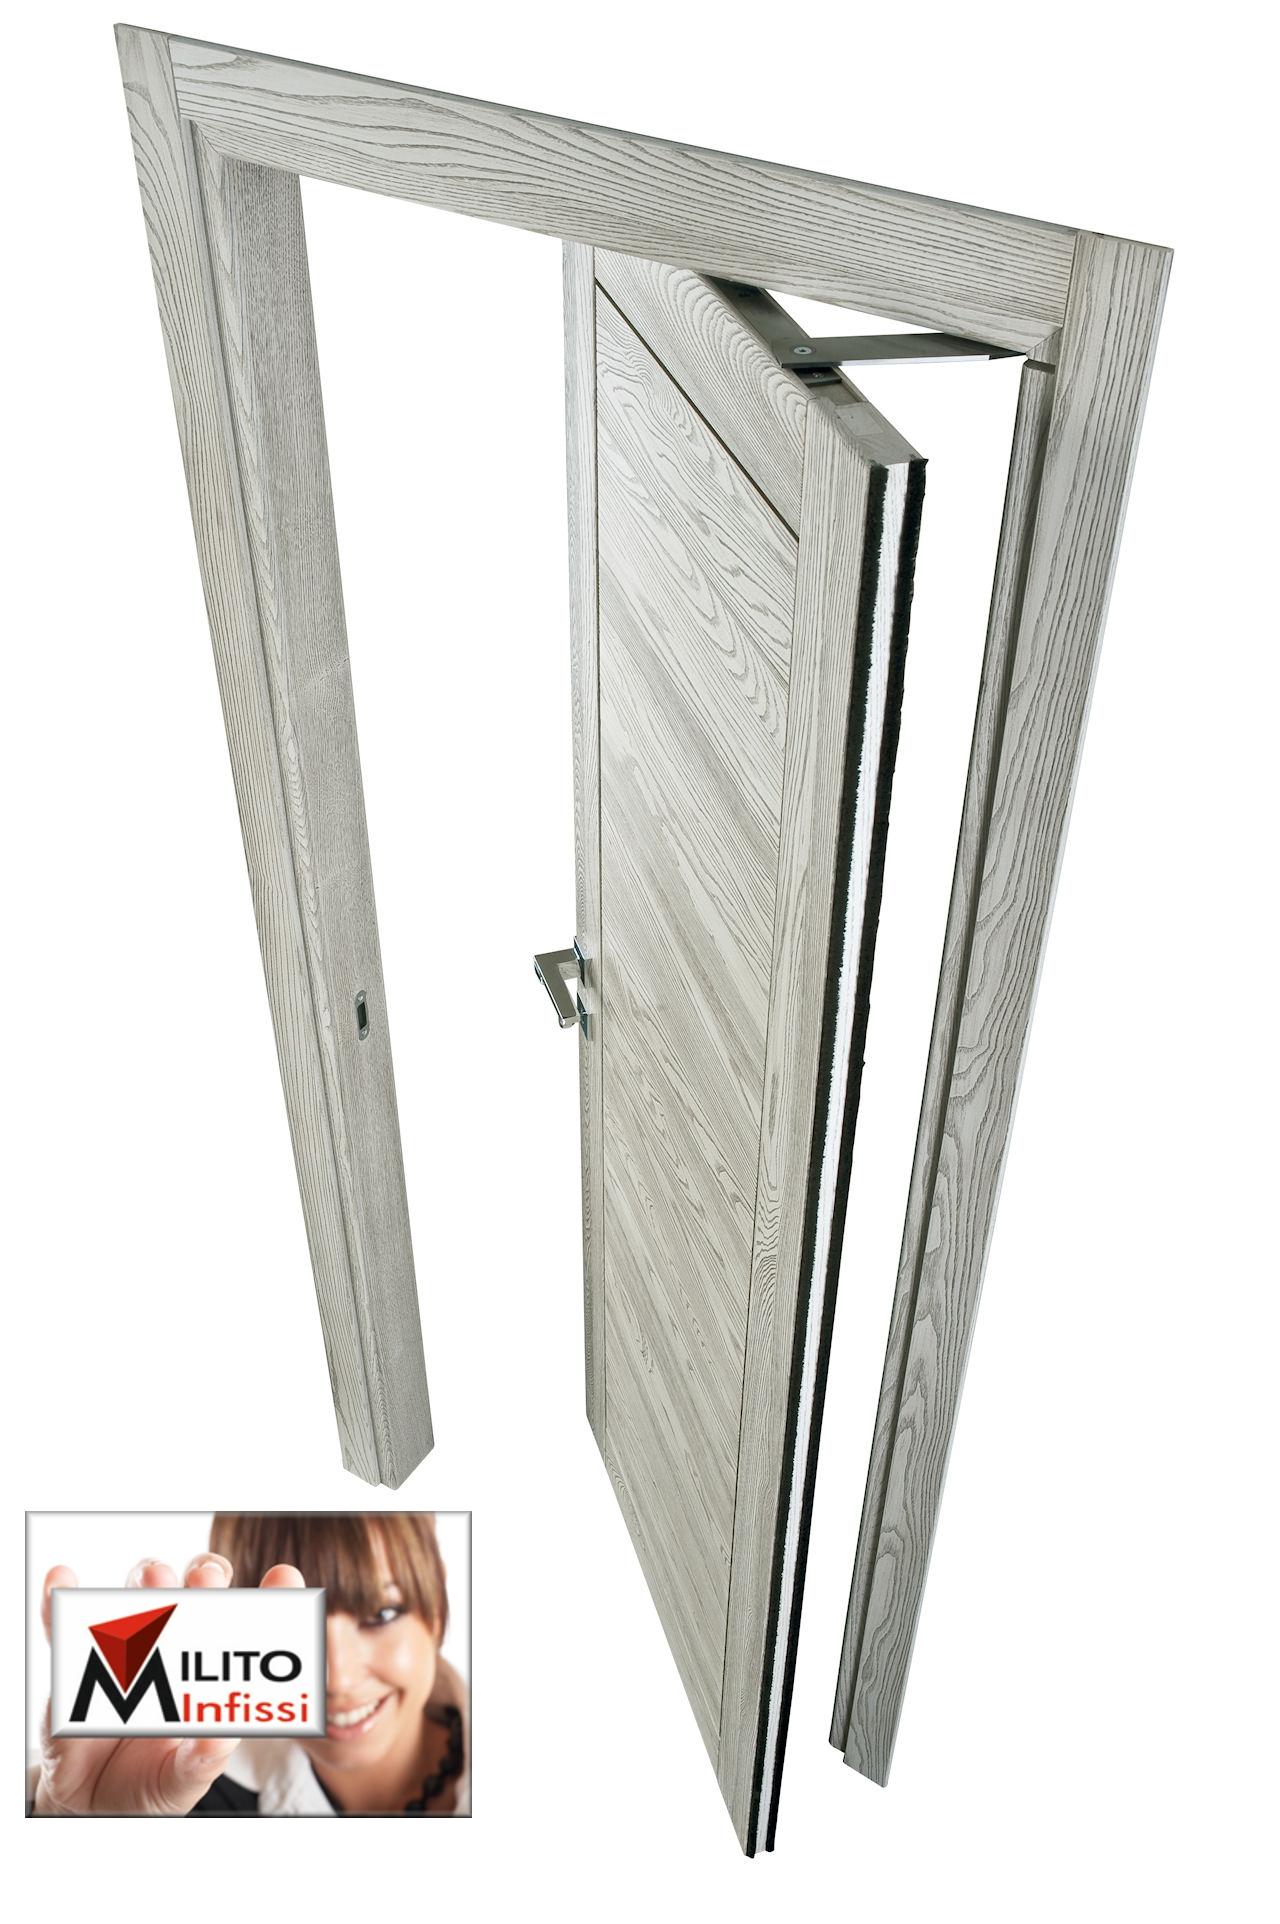 porta interna rototraslante in legno